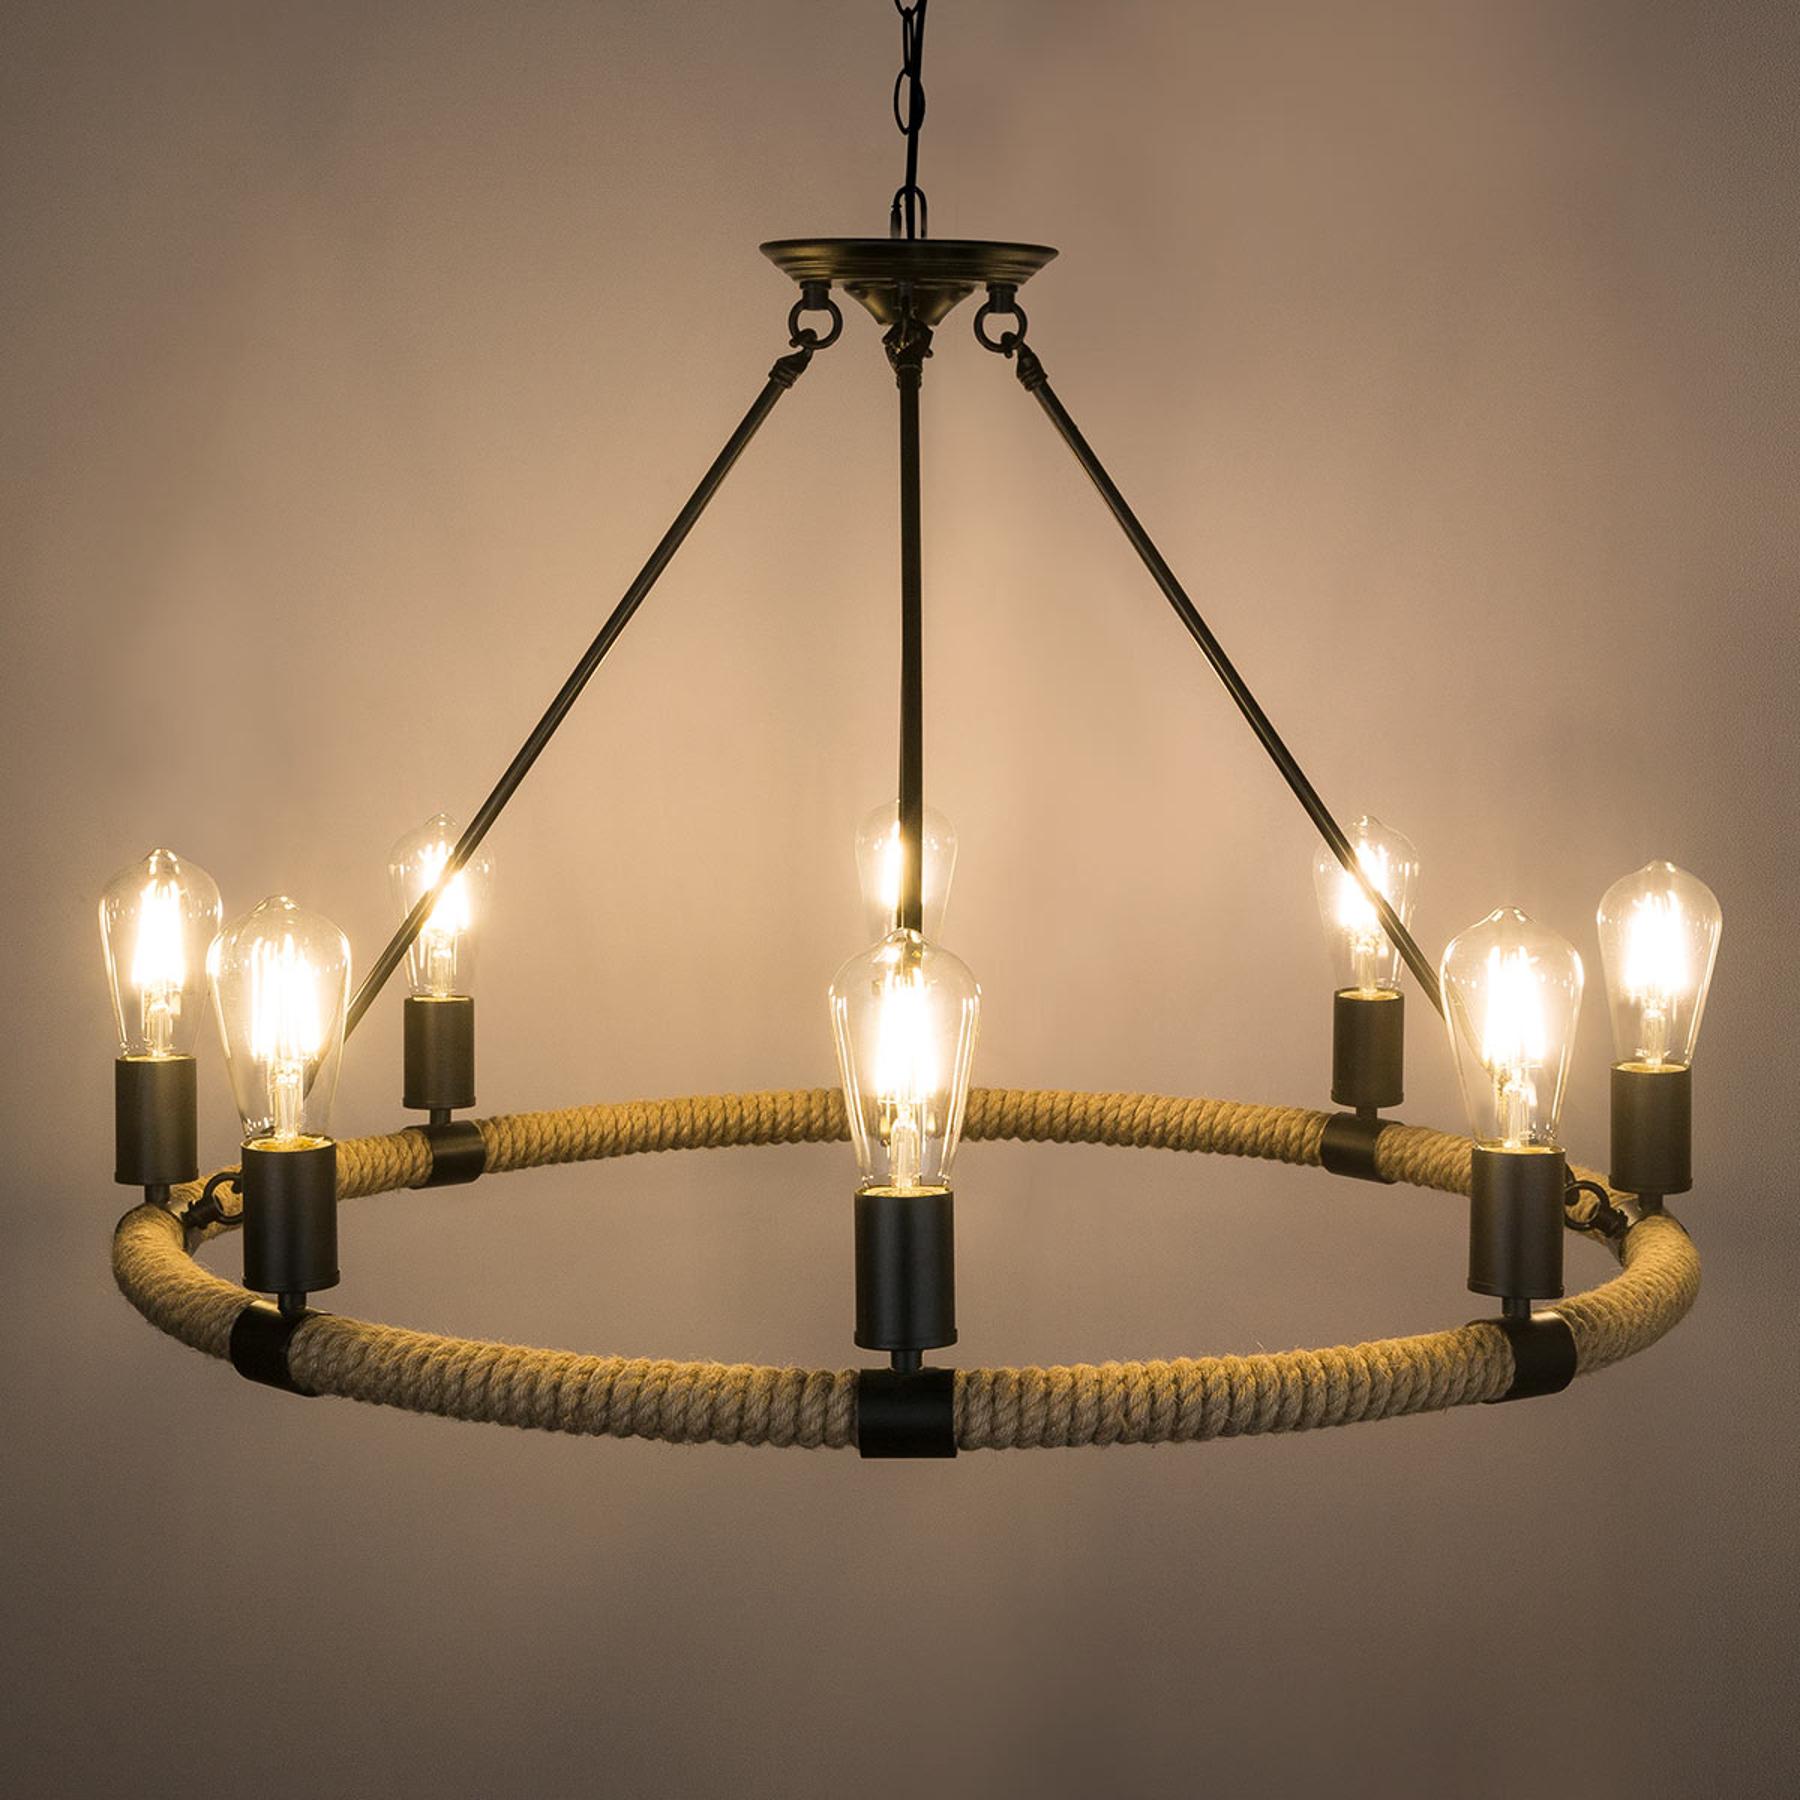 Okrągła lampa wisząca LED Ulleu 8-punktowa